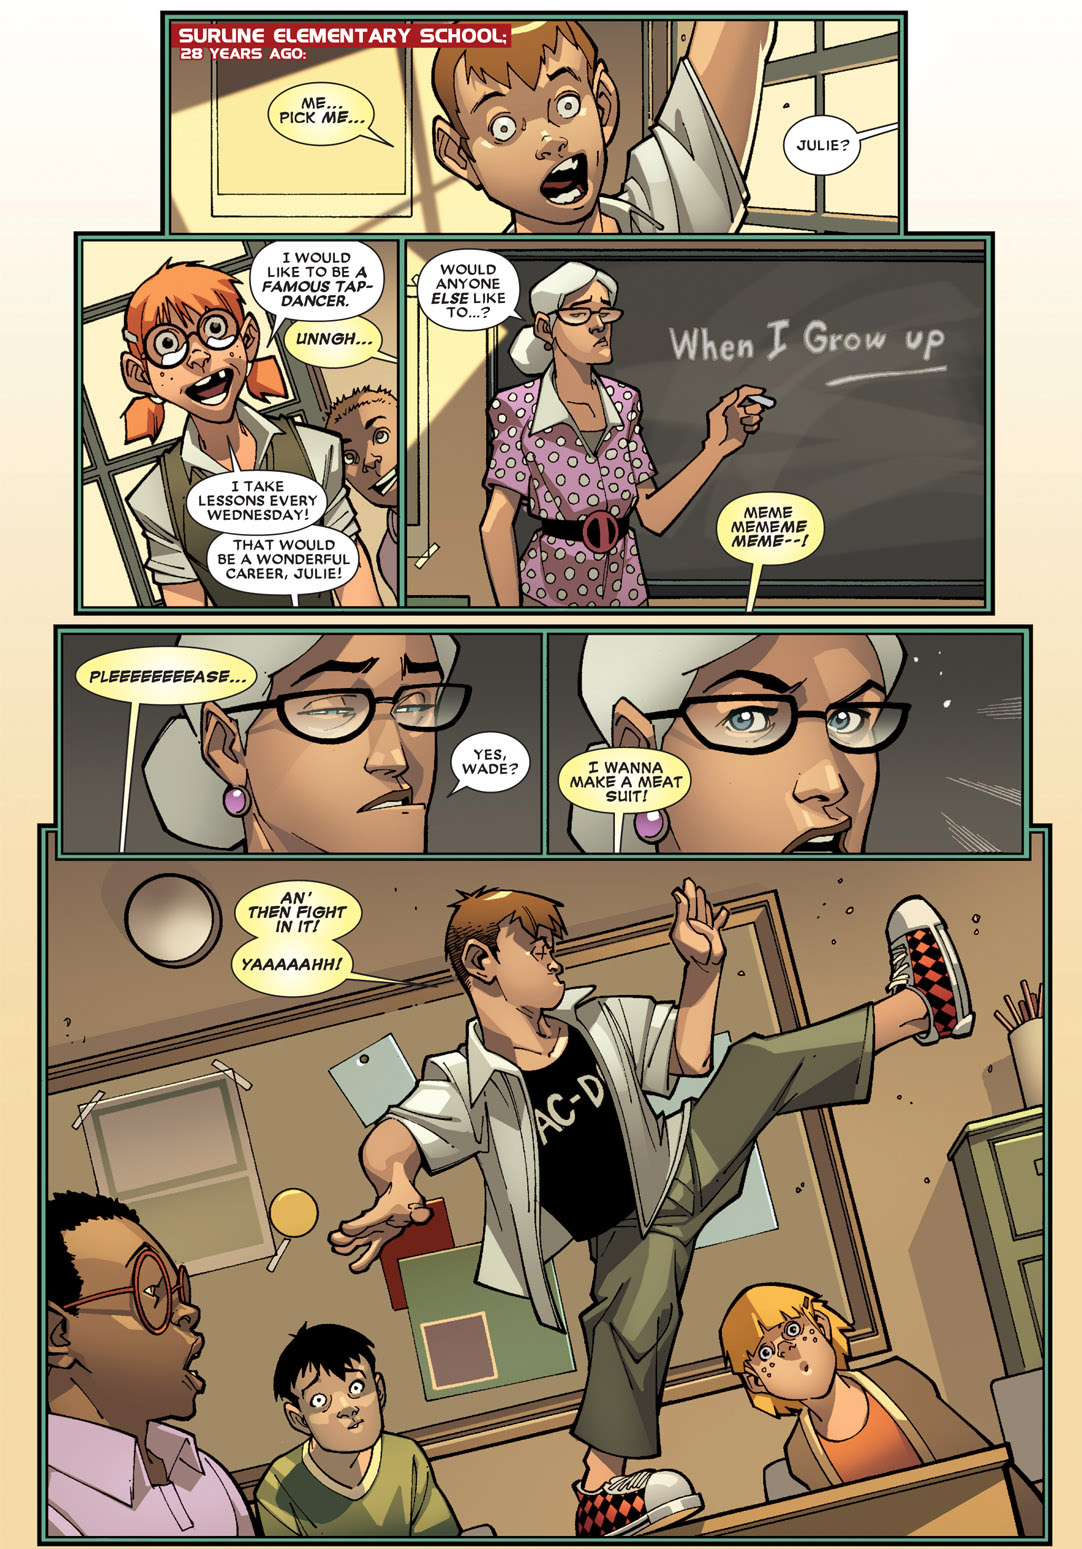 deadpool and dark avenger hawkeye's school flashback